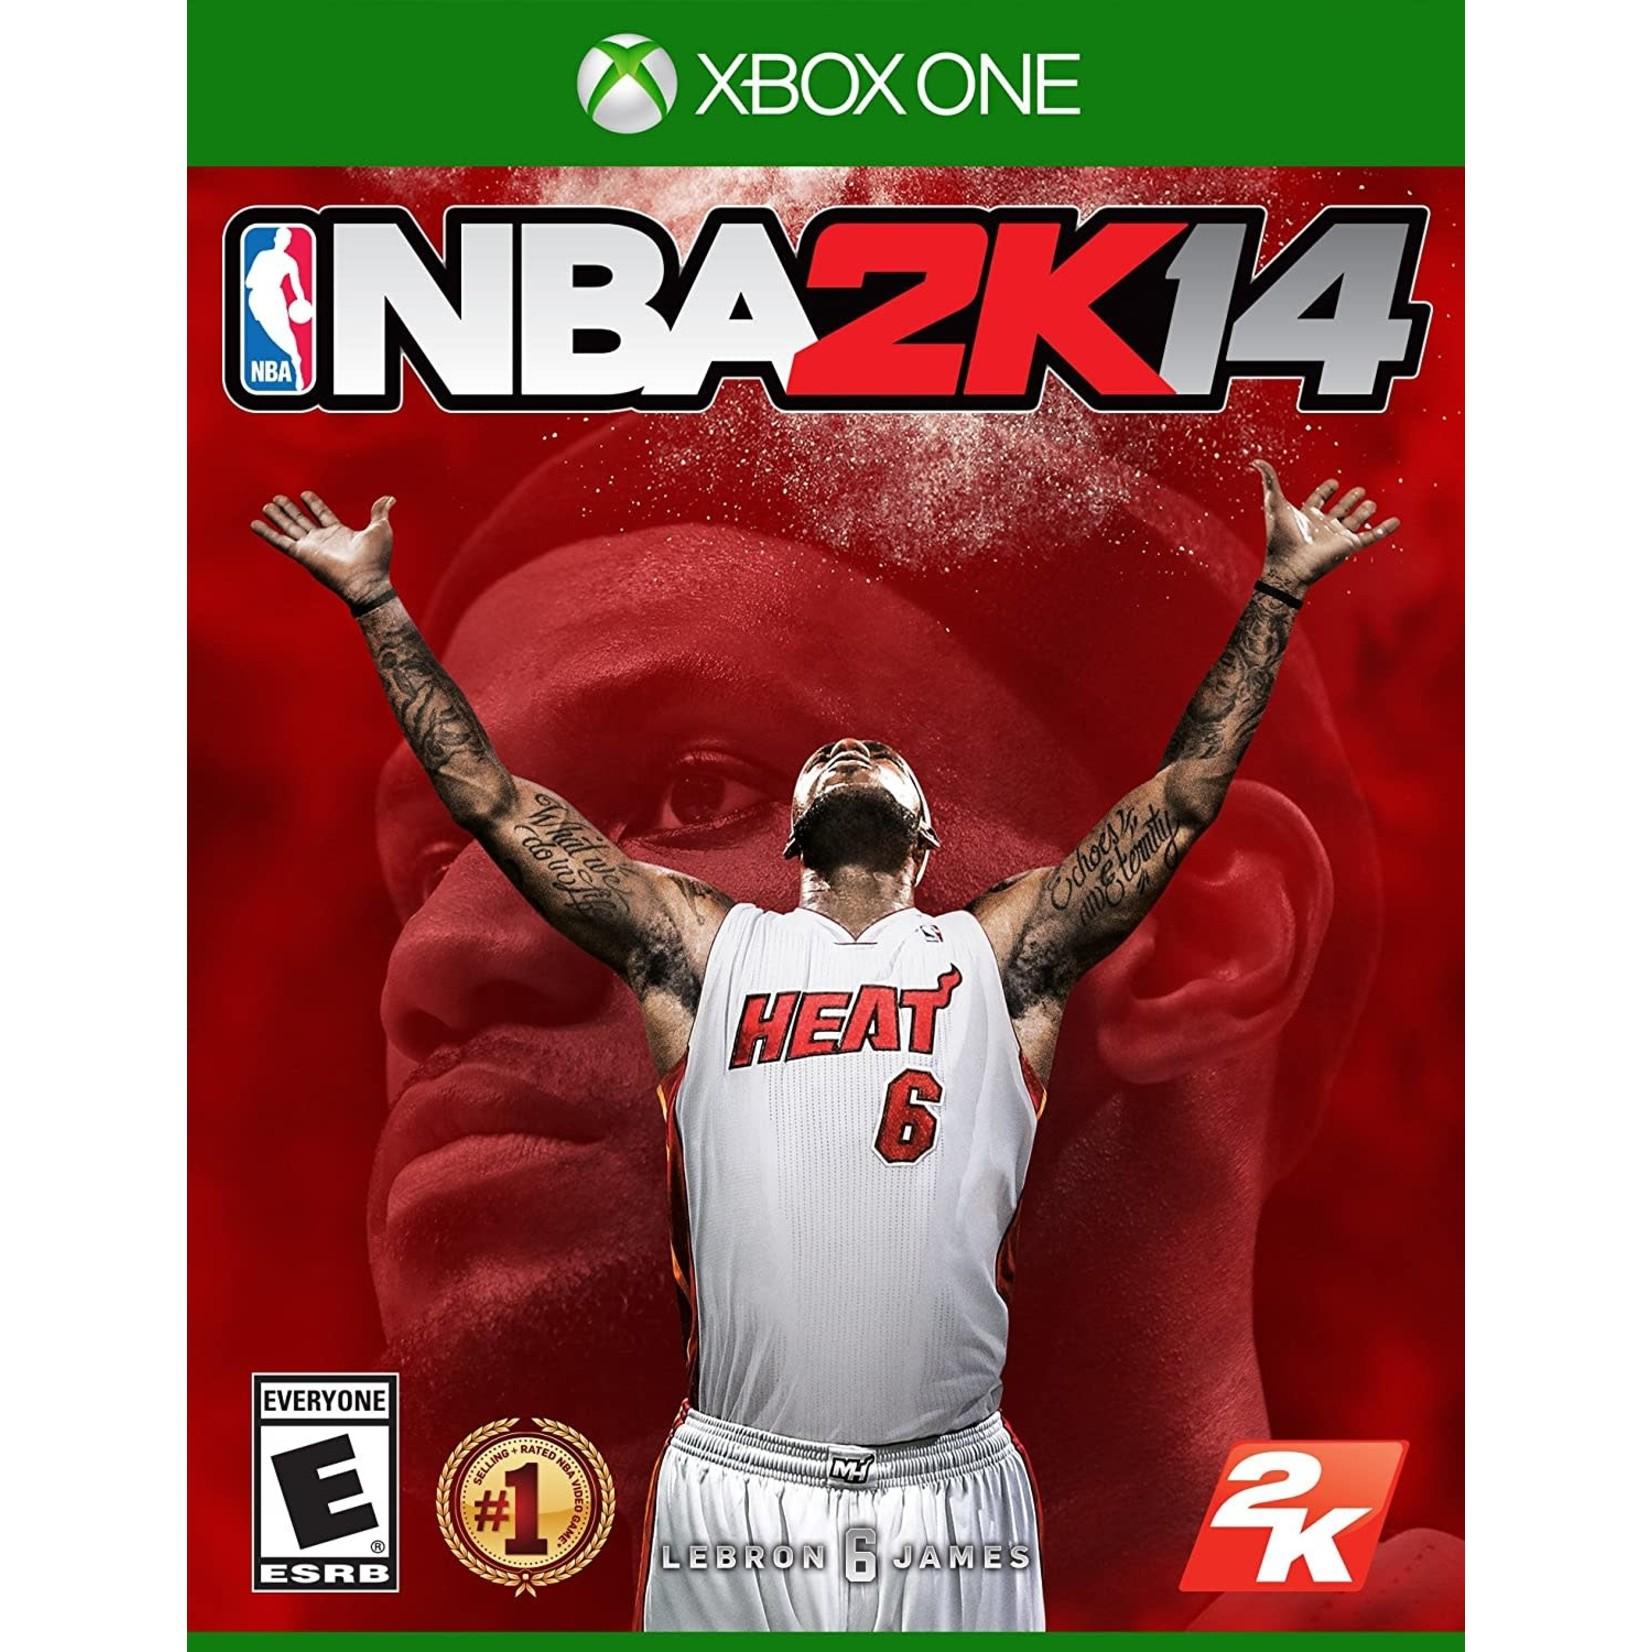 XB1U-NBA 2K14